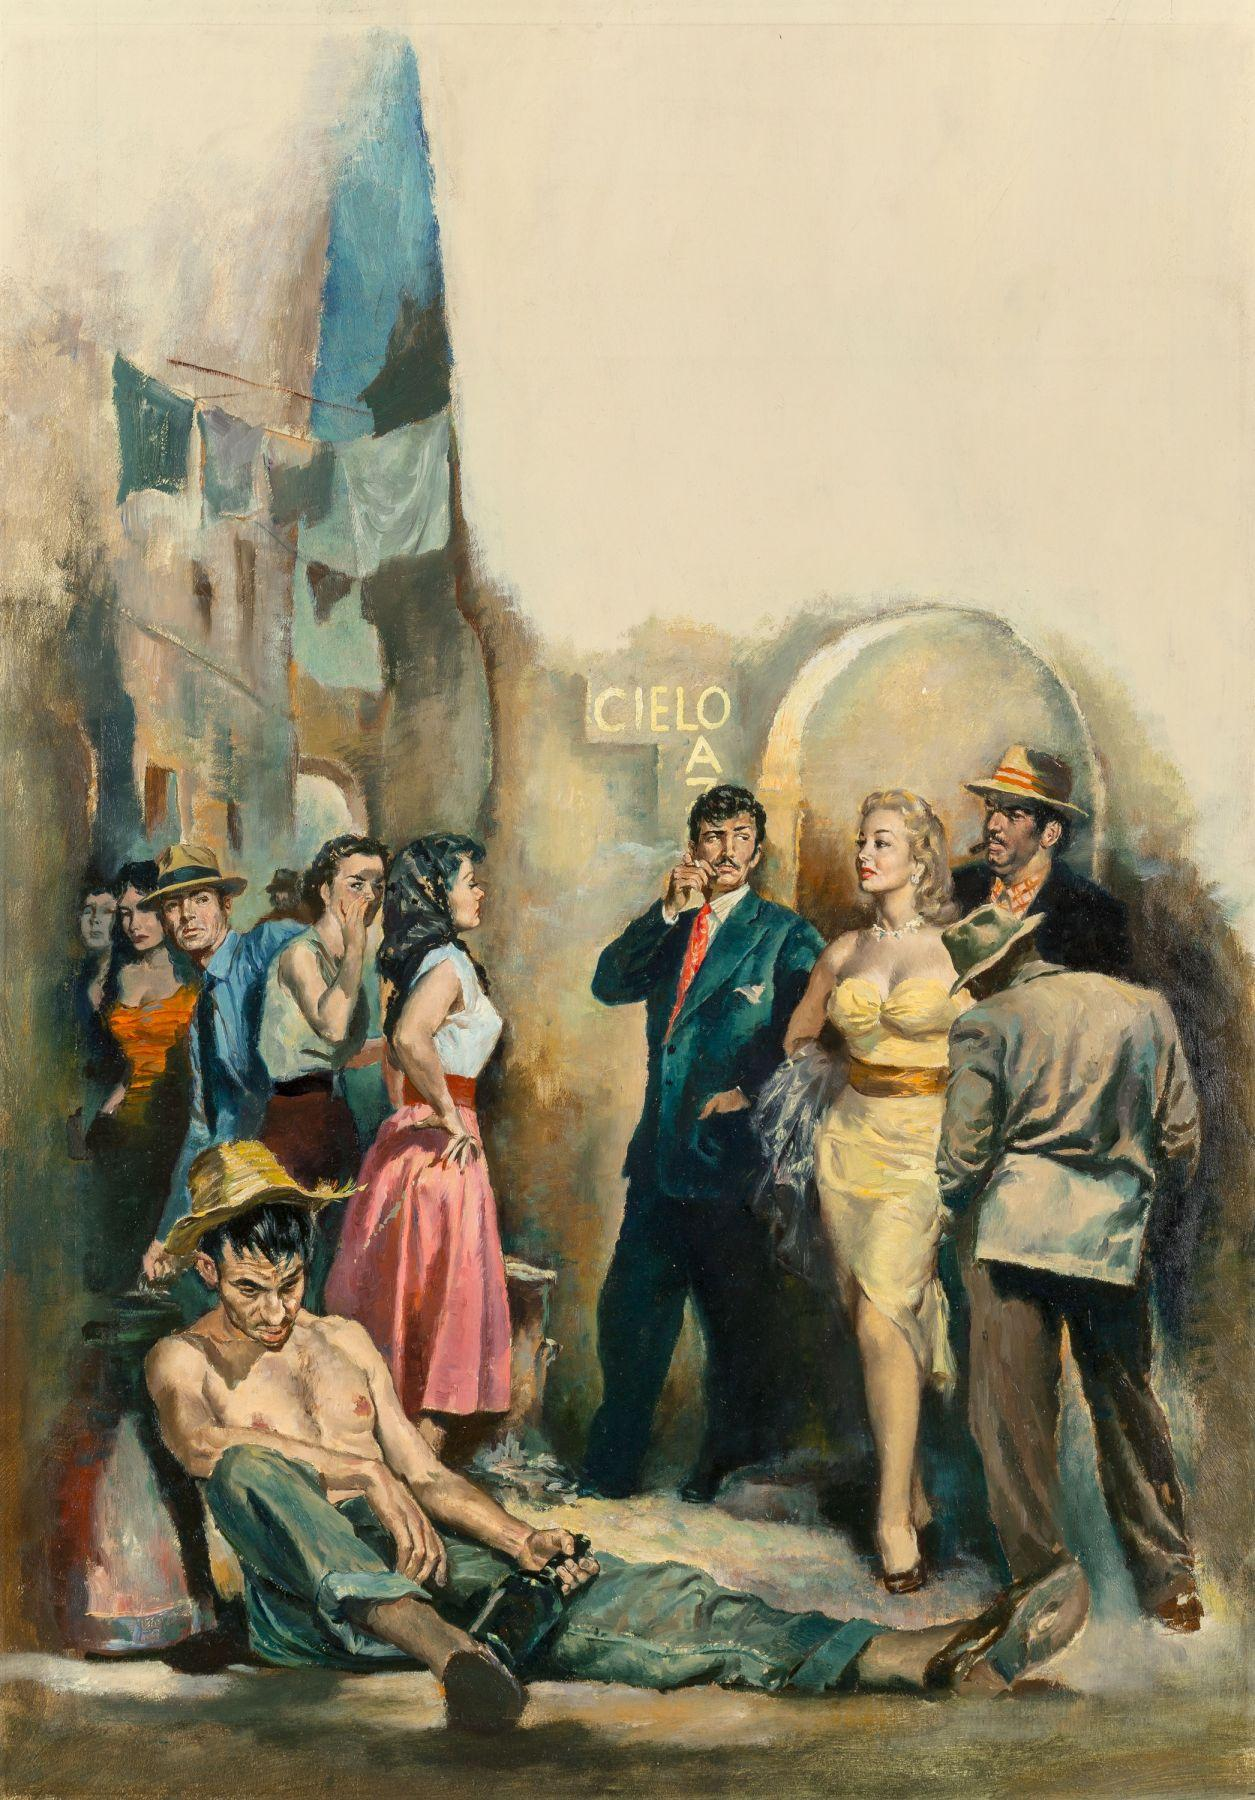 Burro Alley, Paperback Cover, 1953